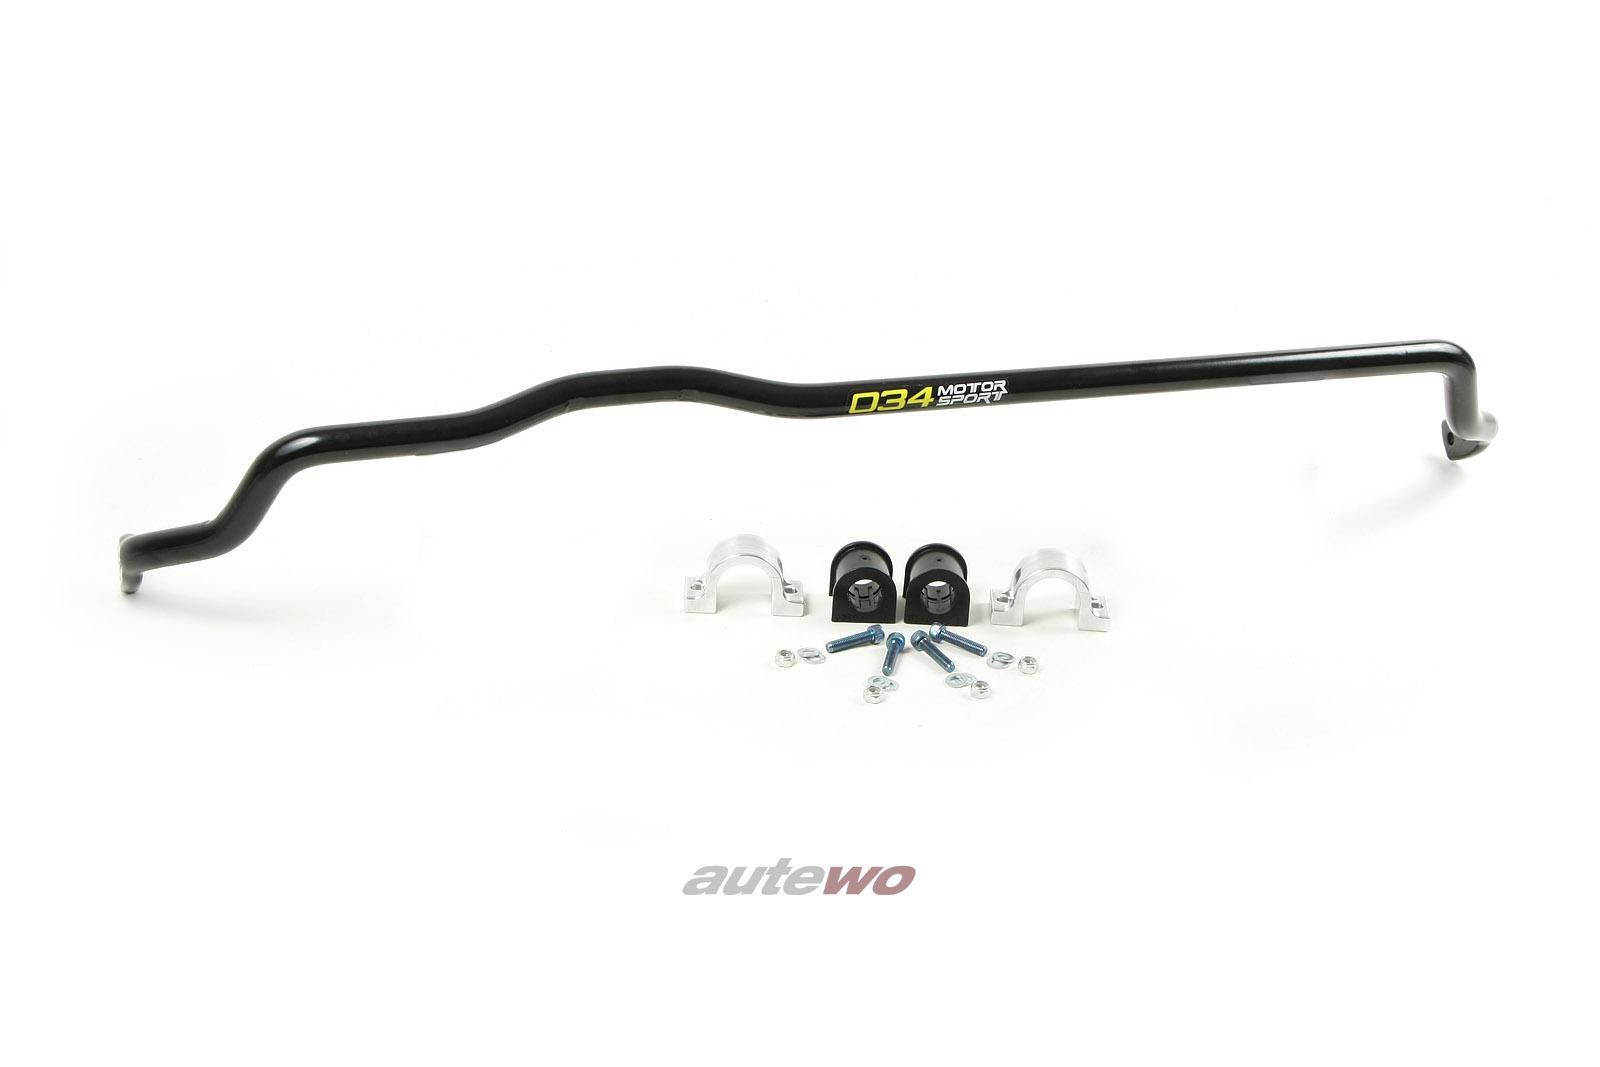 034Motorsport Audi 80 B4/S2/RS2/A4/S4/RS4 B5 verstellbarer Stabilisator 25mm